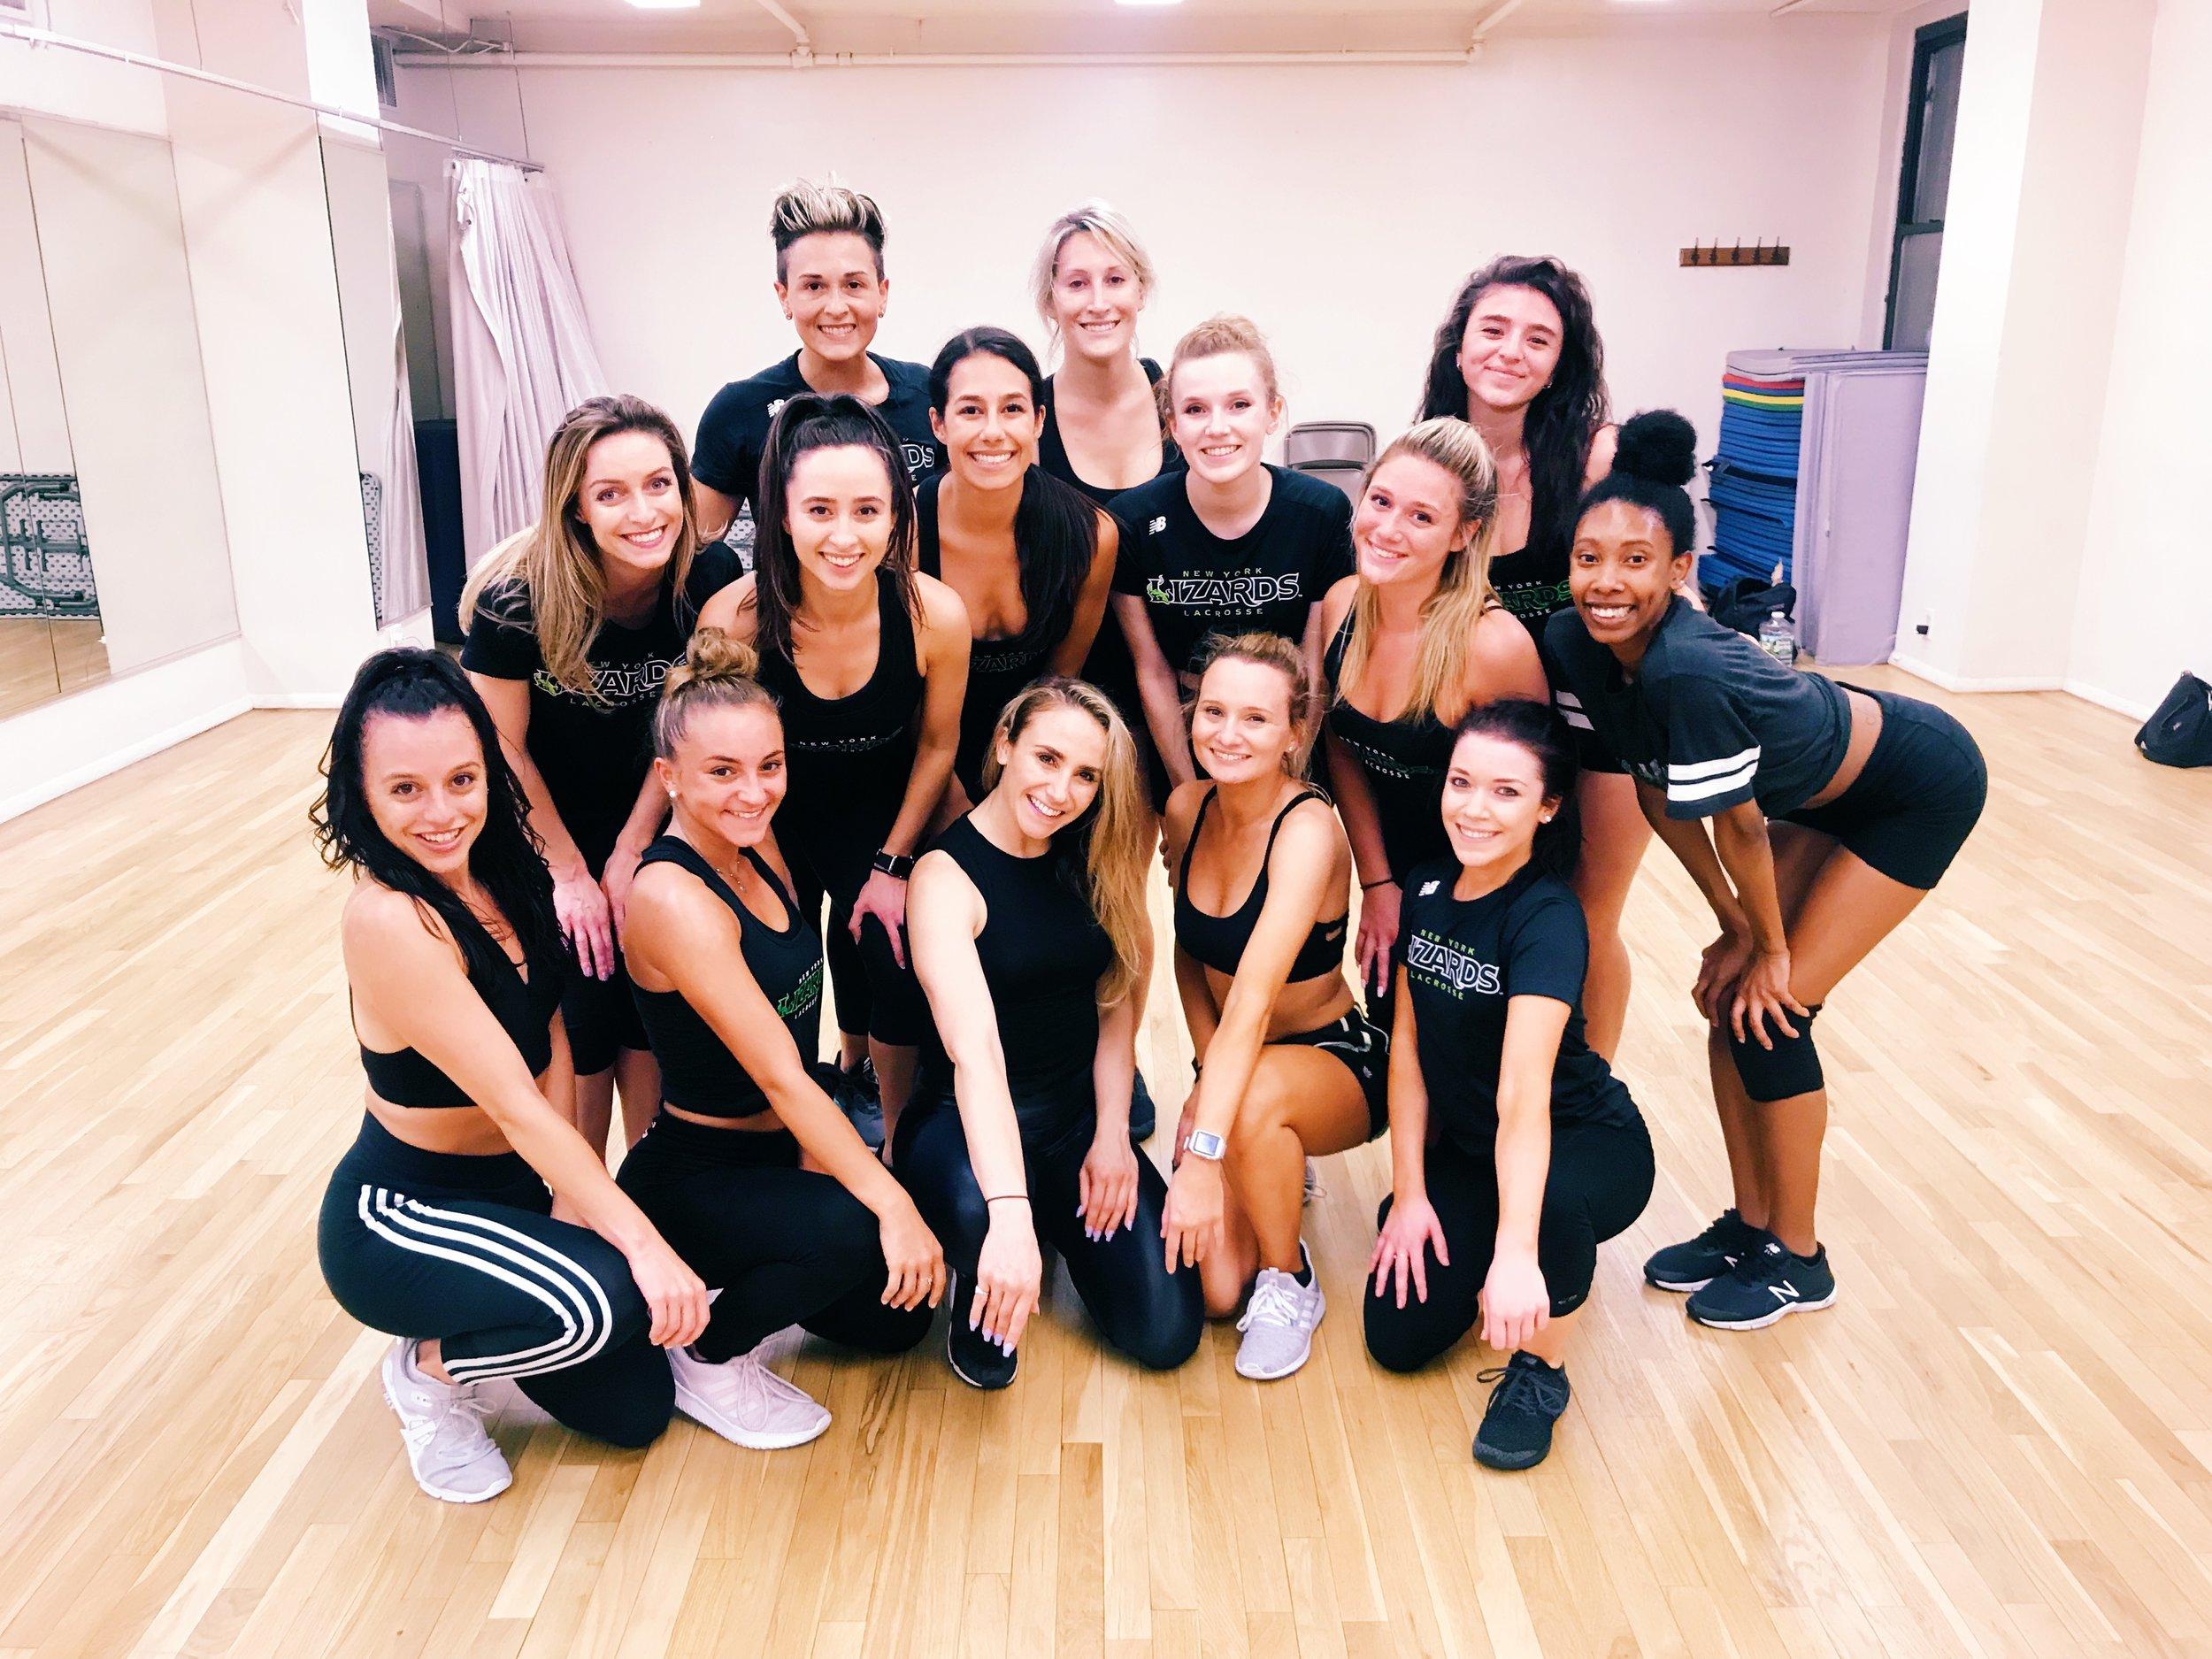 New York Lizards Professional Dance Team